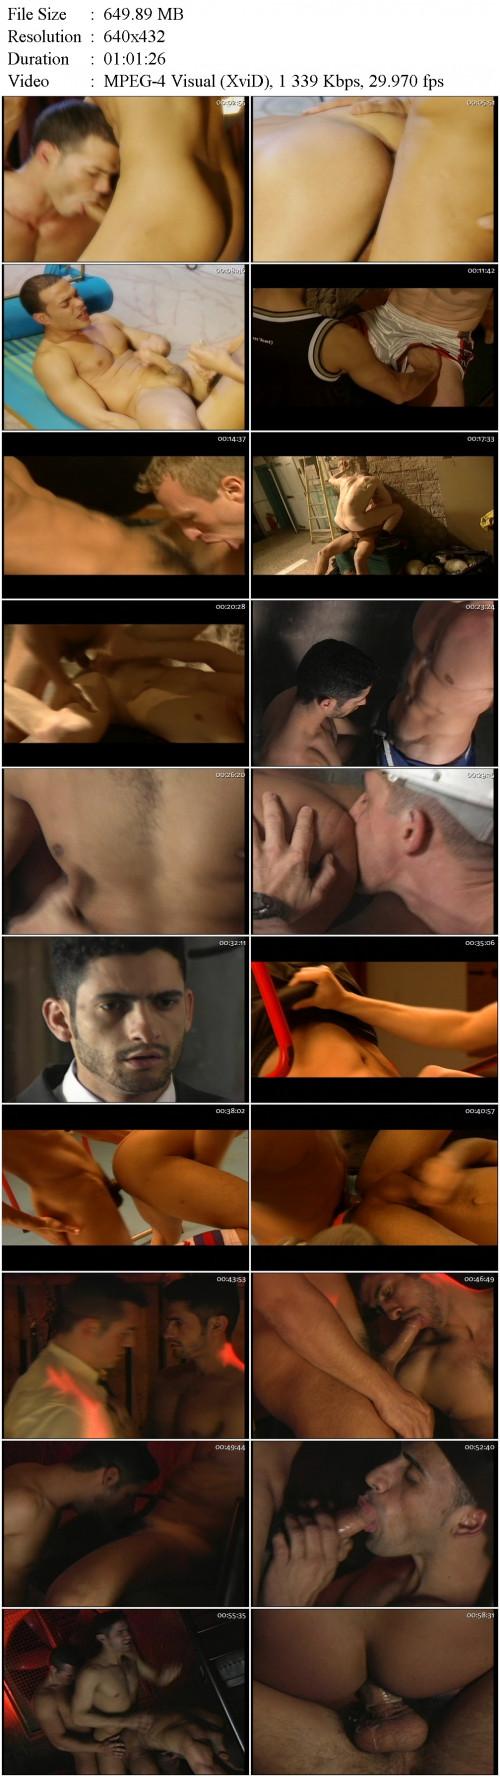 Private Man - Director Lucas Foz, Marc Lynnroe, Sebastiano Brogi - Private Manstars - Lucas Foz, Brazilian Sex God